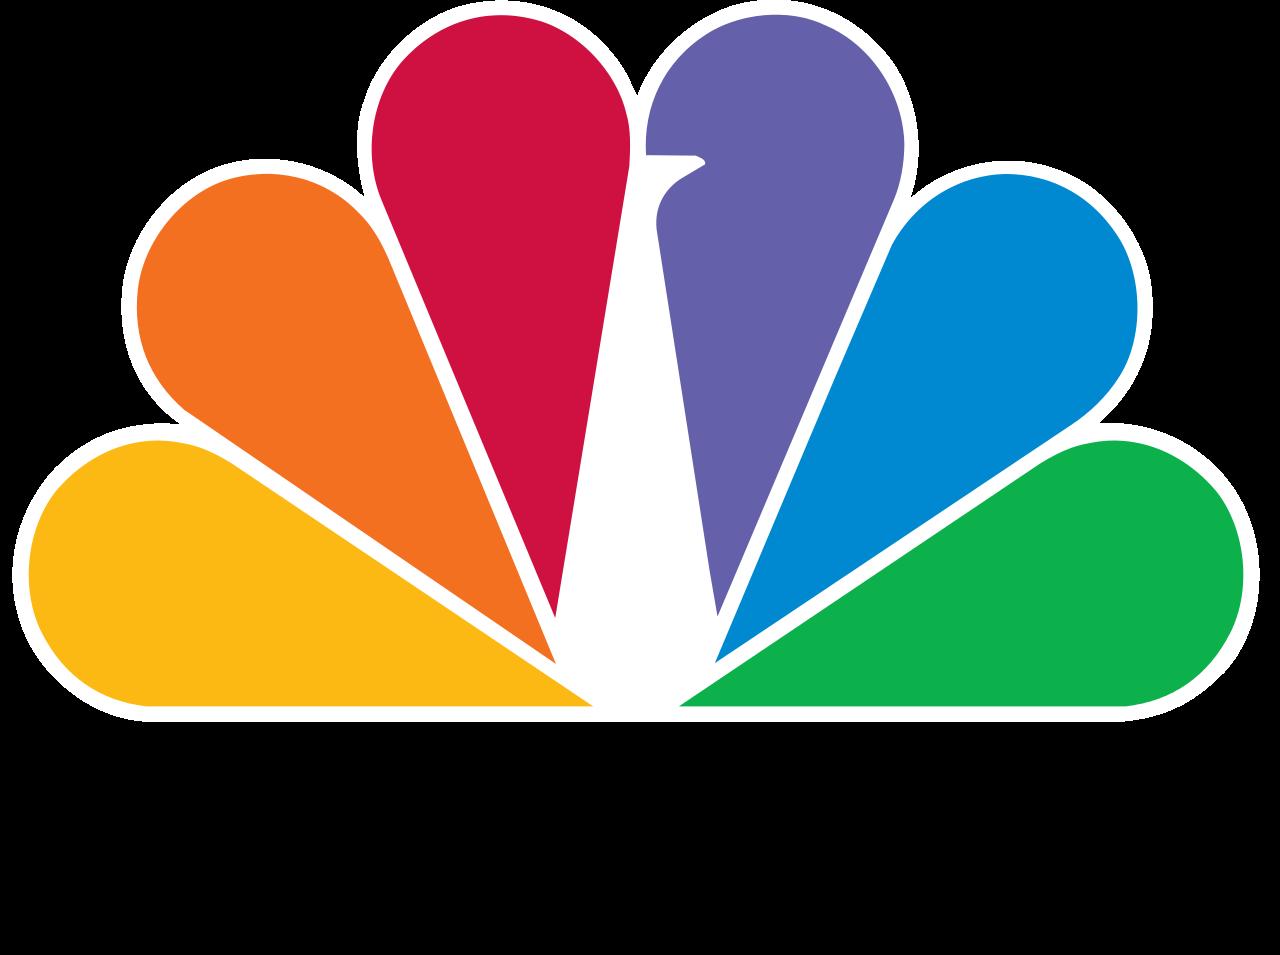 Cnbc_logo-3.png